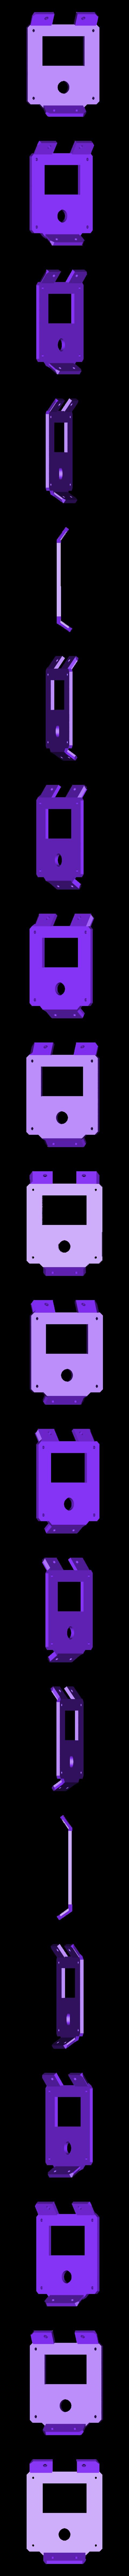 cover.stl Download free STL file ender 2 box remix and raspberry pi box • 3D printing object, raffosan